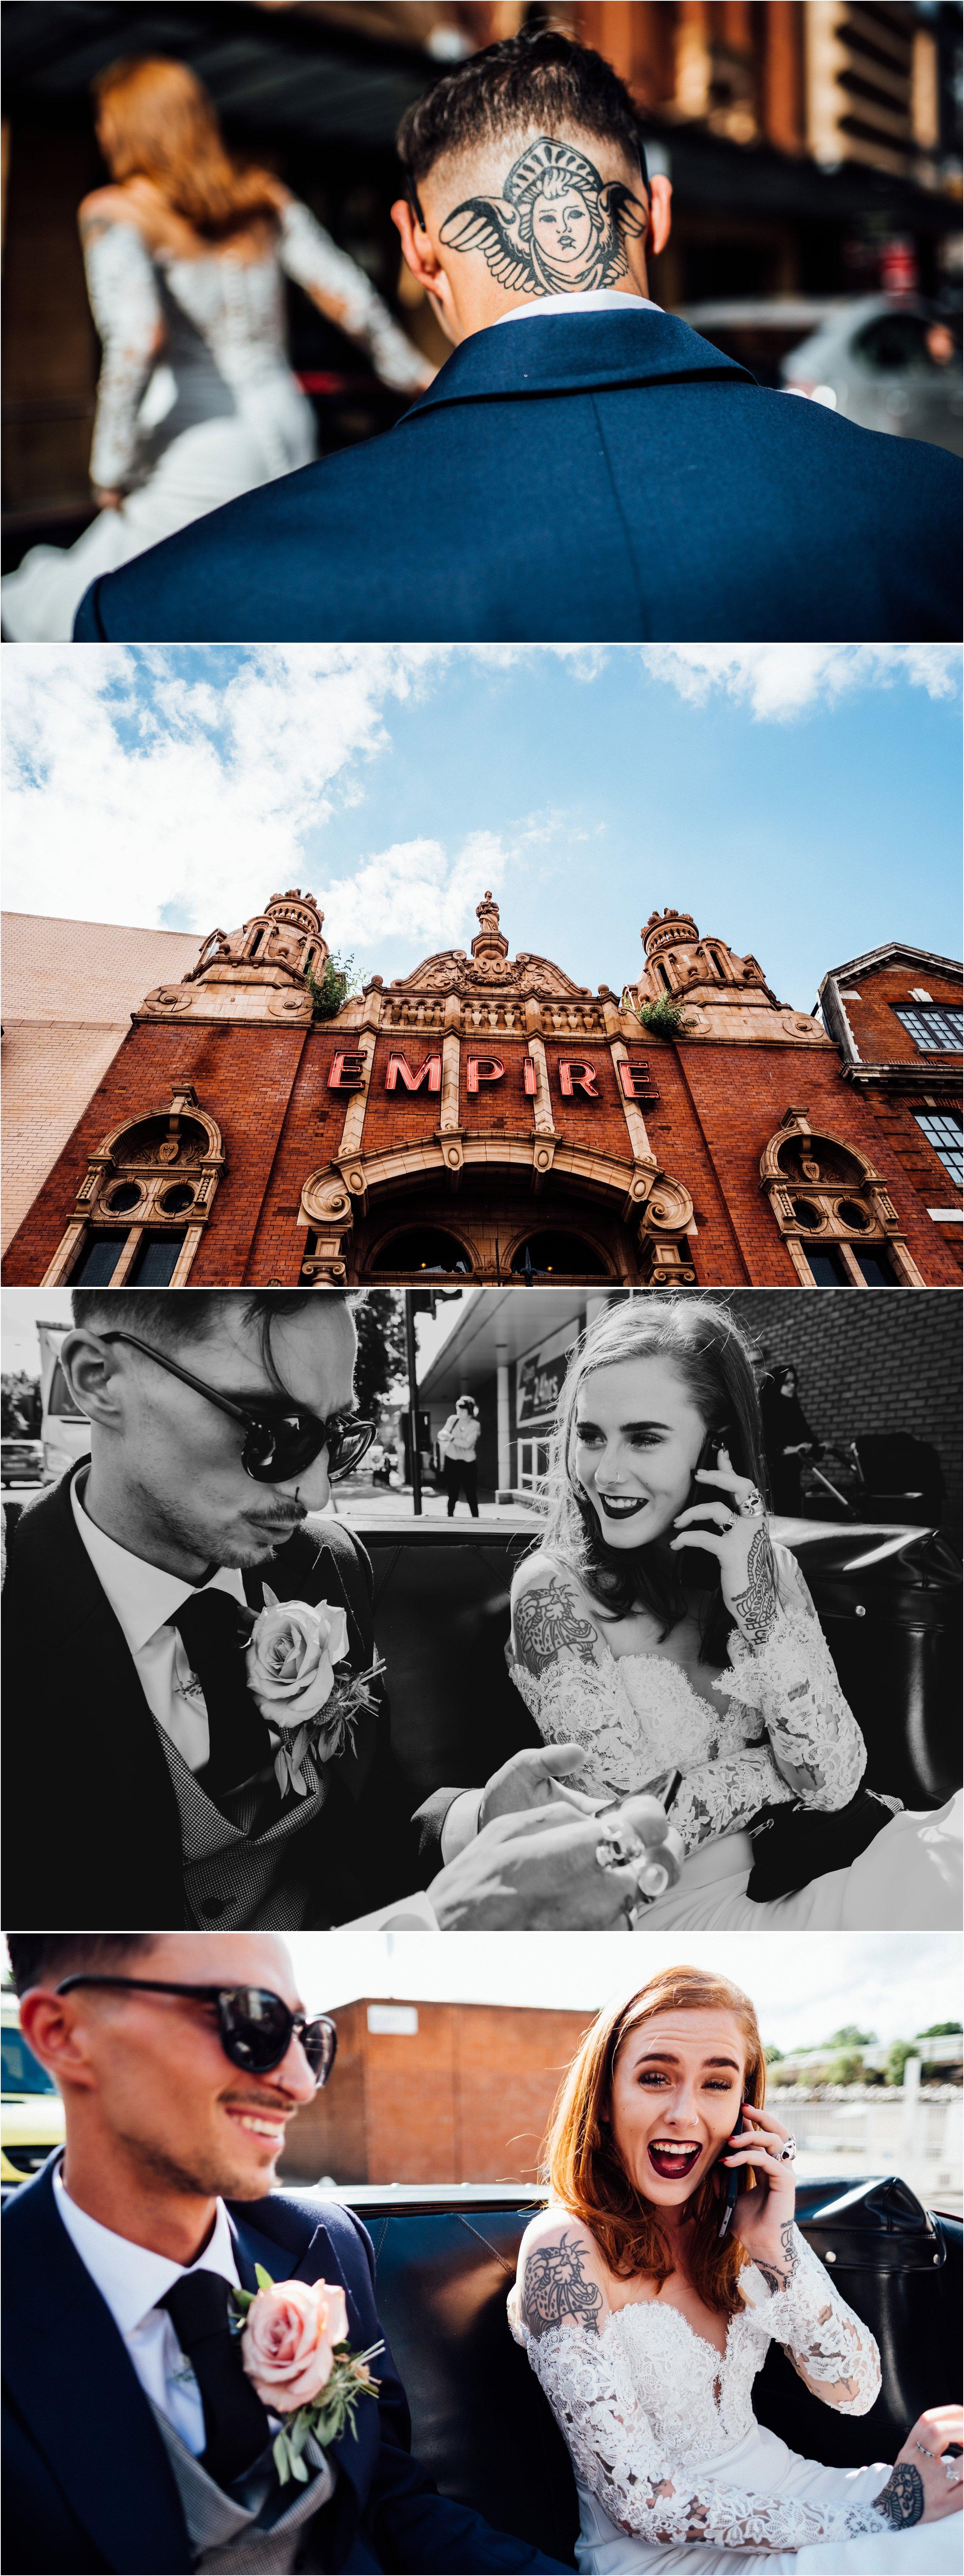 Hackney town hall wedding photography_0096.jpg